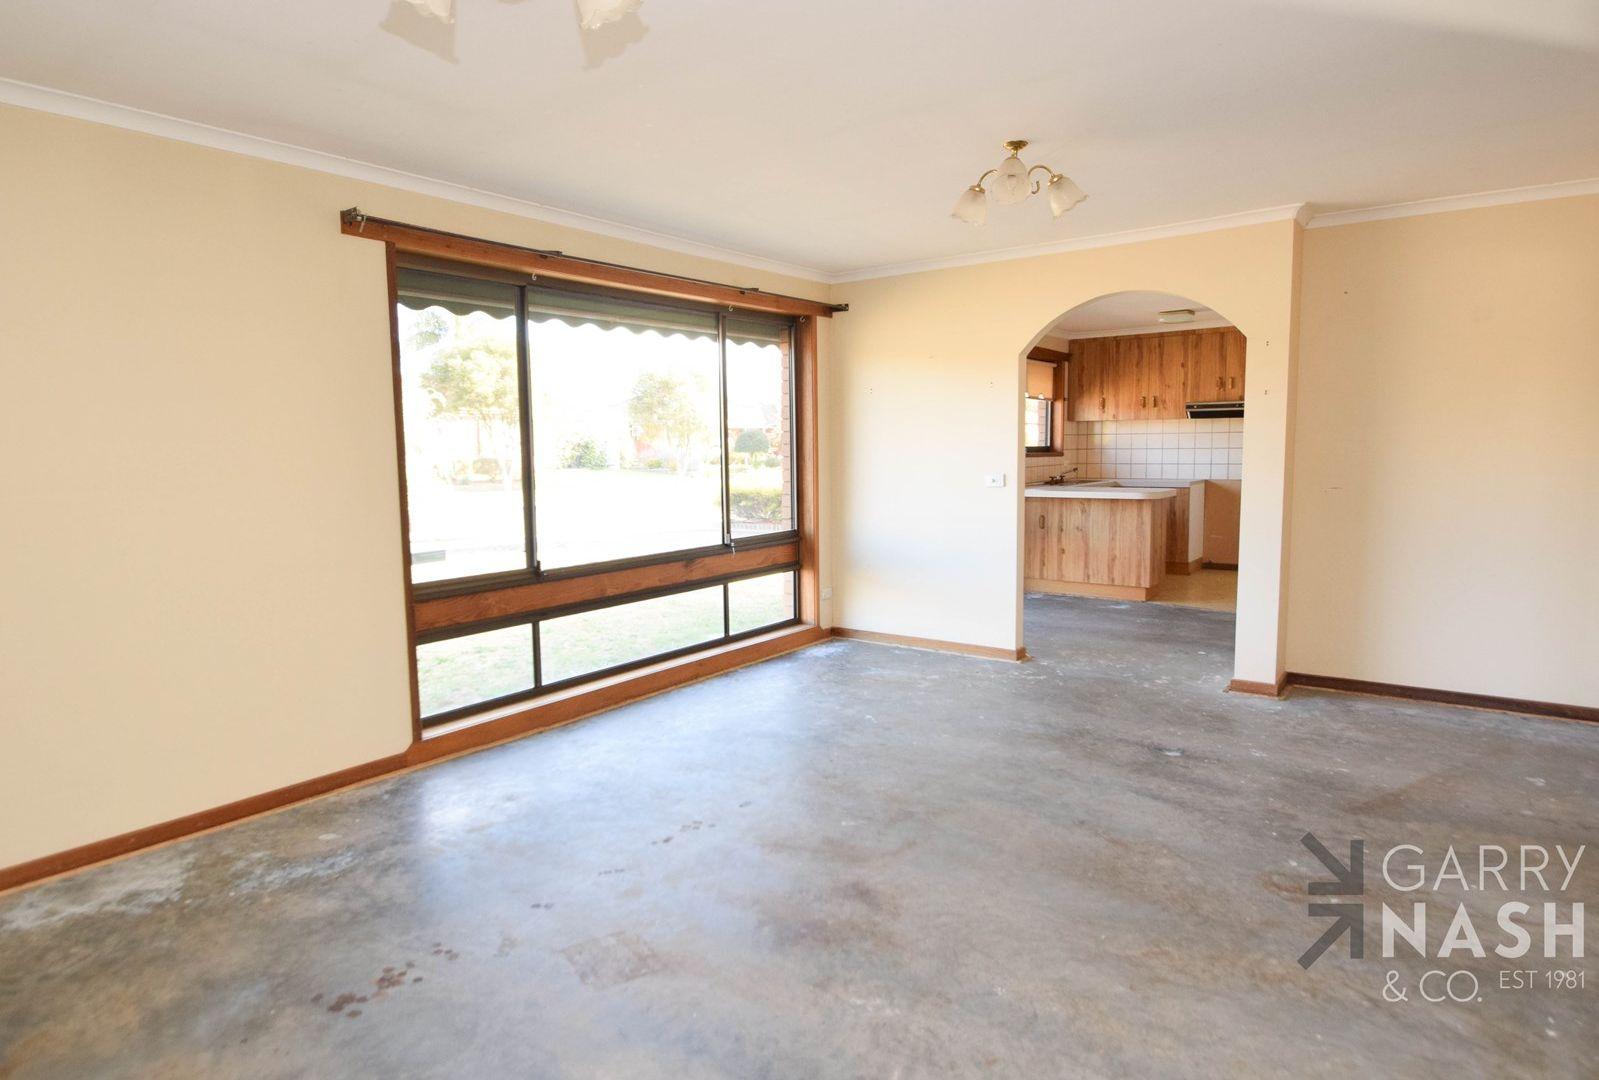 1/11 Hulme Drive, Wangaratta VIC 3677, Image 1